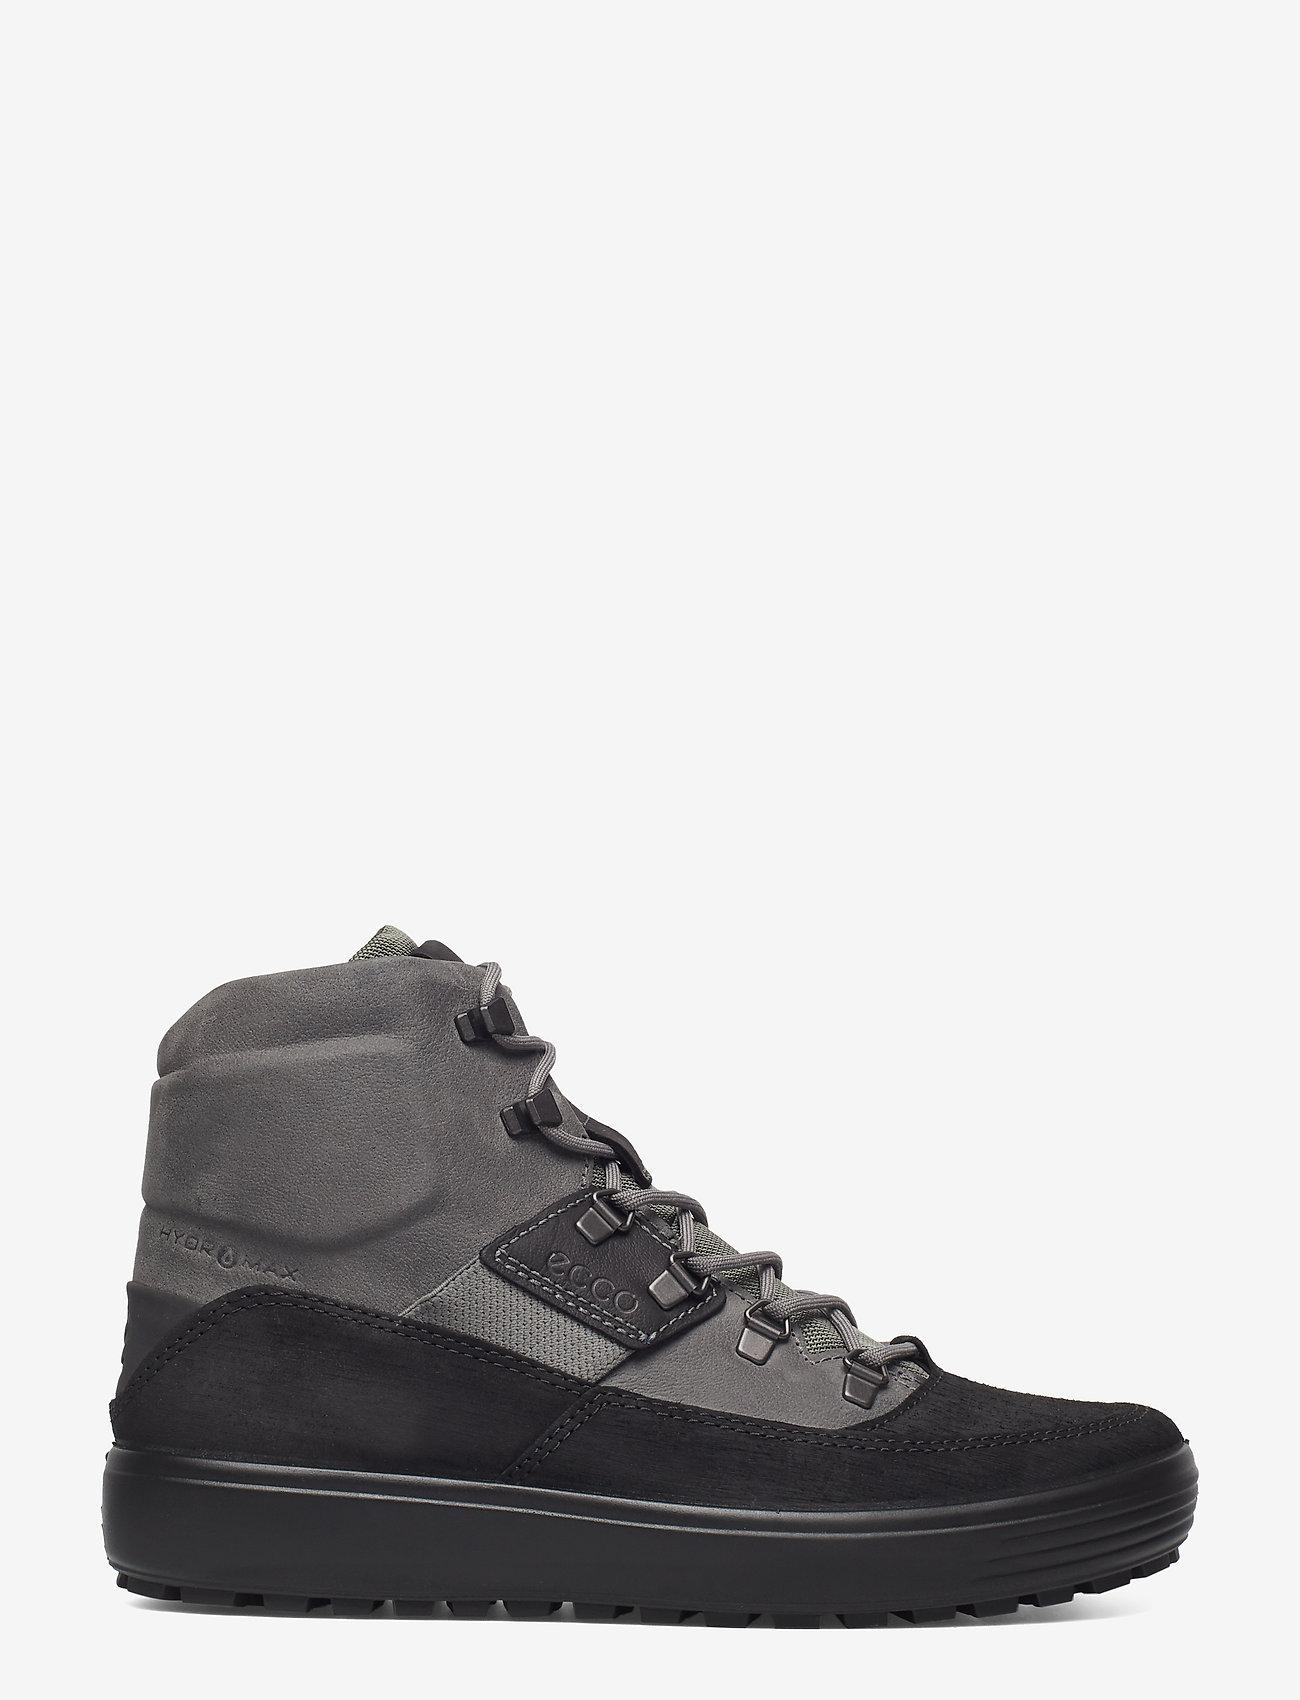 ECCO - SOFT 7 TRED M - laced boots - black/titanium - 1